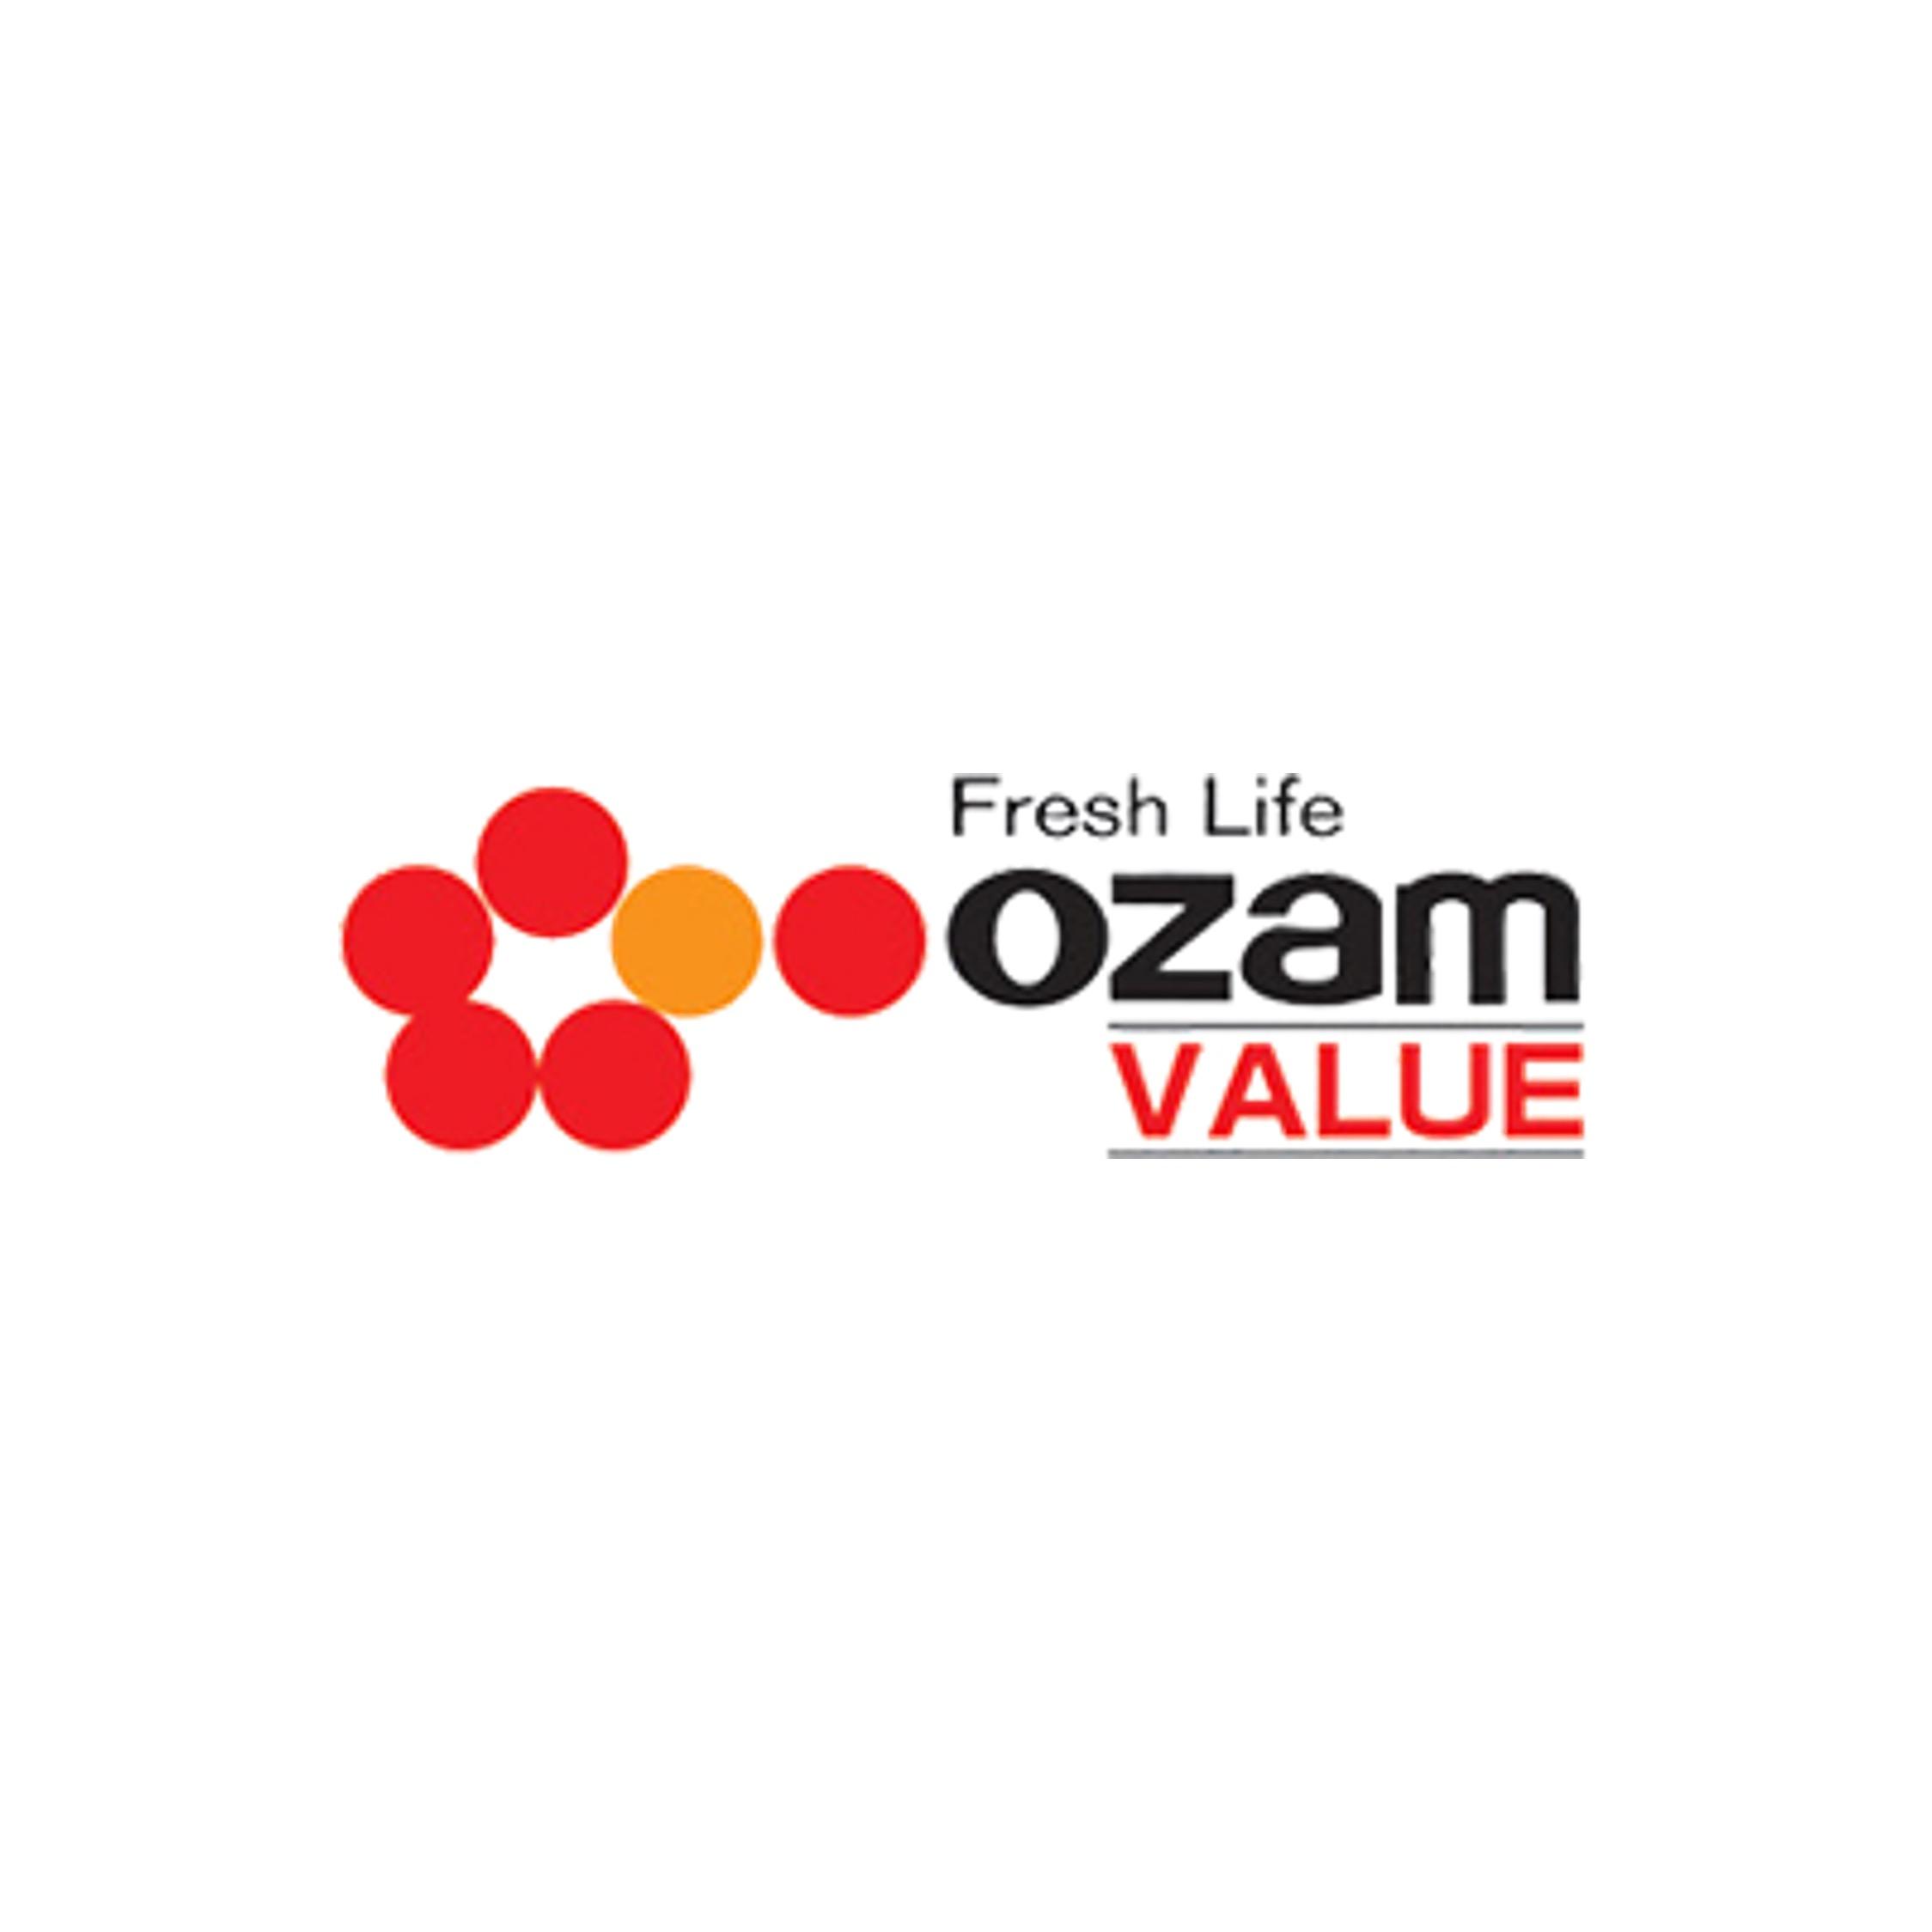 Logo ozamvalue